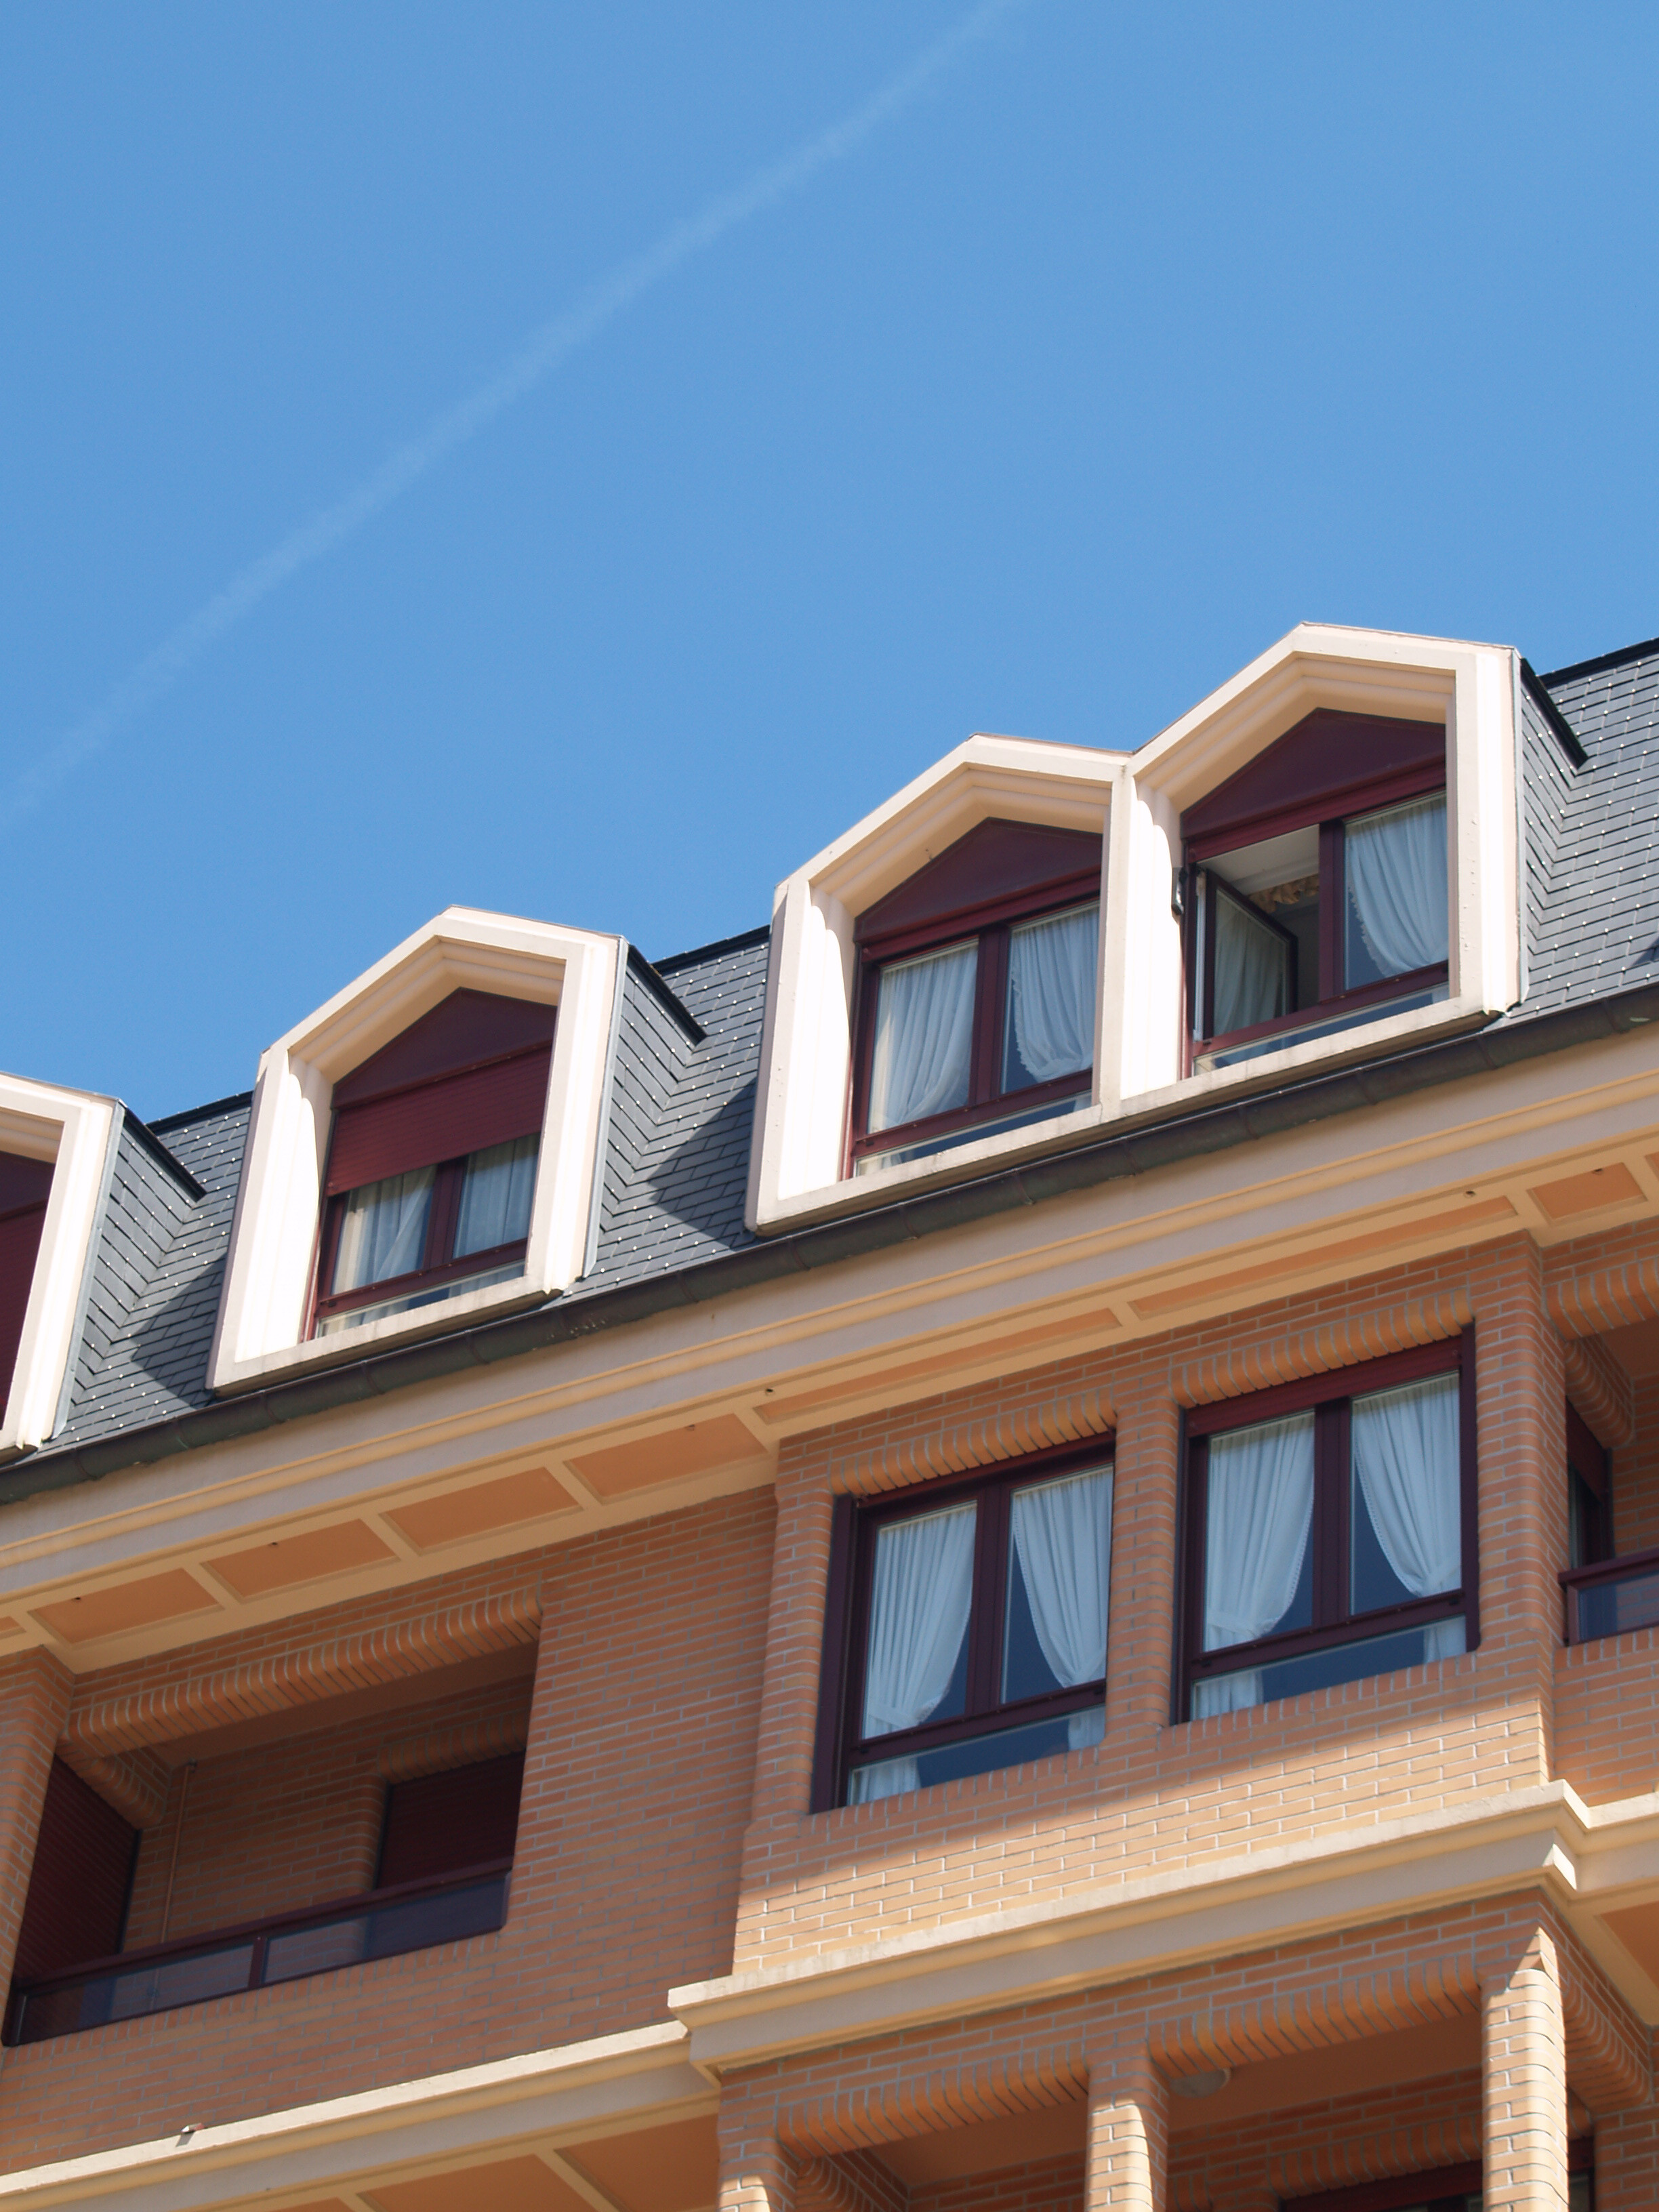 Decorative cornices and Window Surrounds in Zarauz